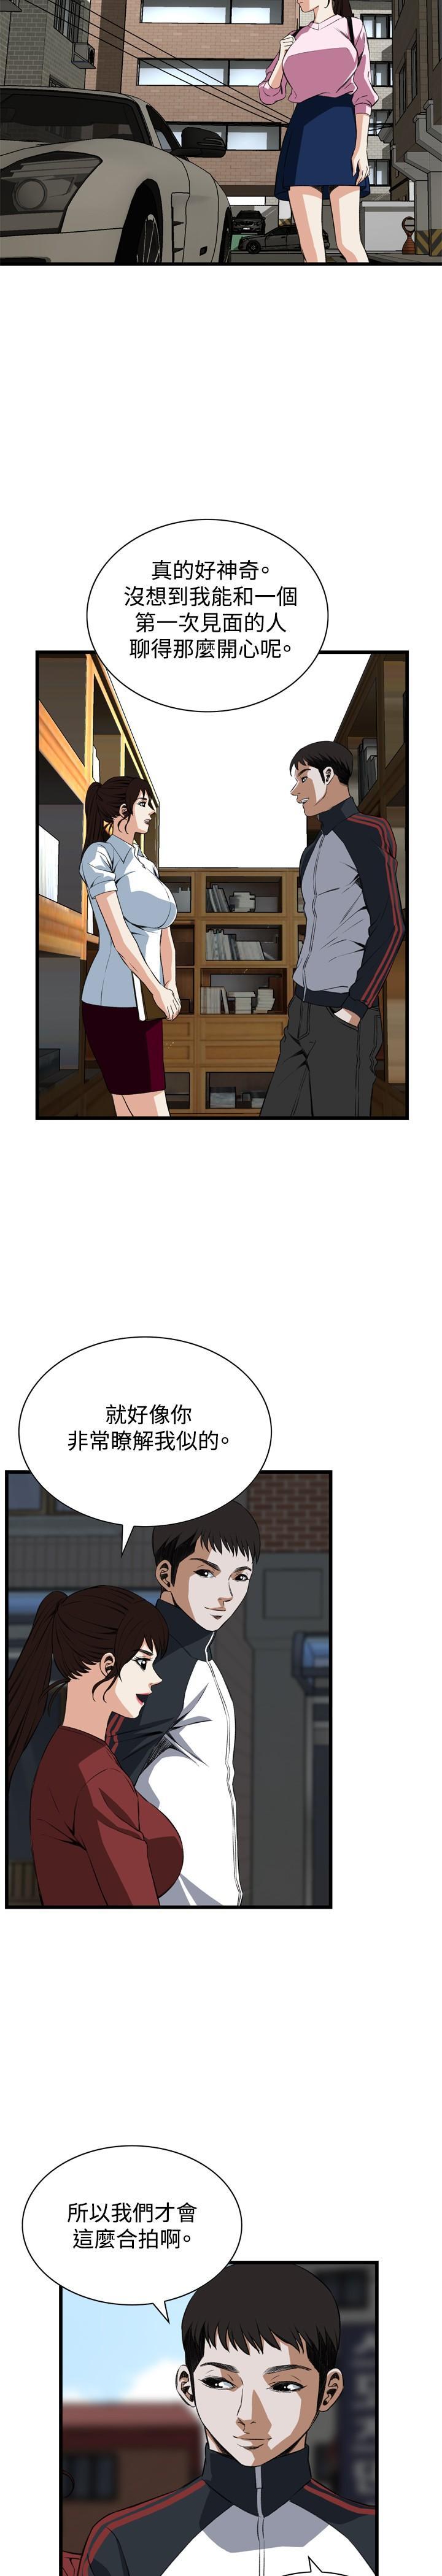 Take a Peek 偷窥 Ch.39~60 [Chinese]中文 608